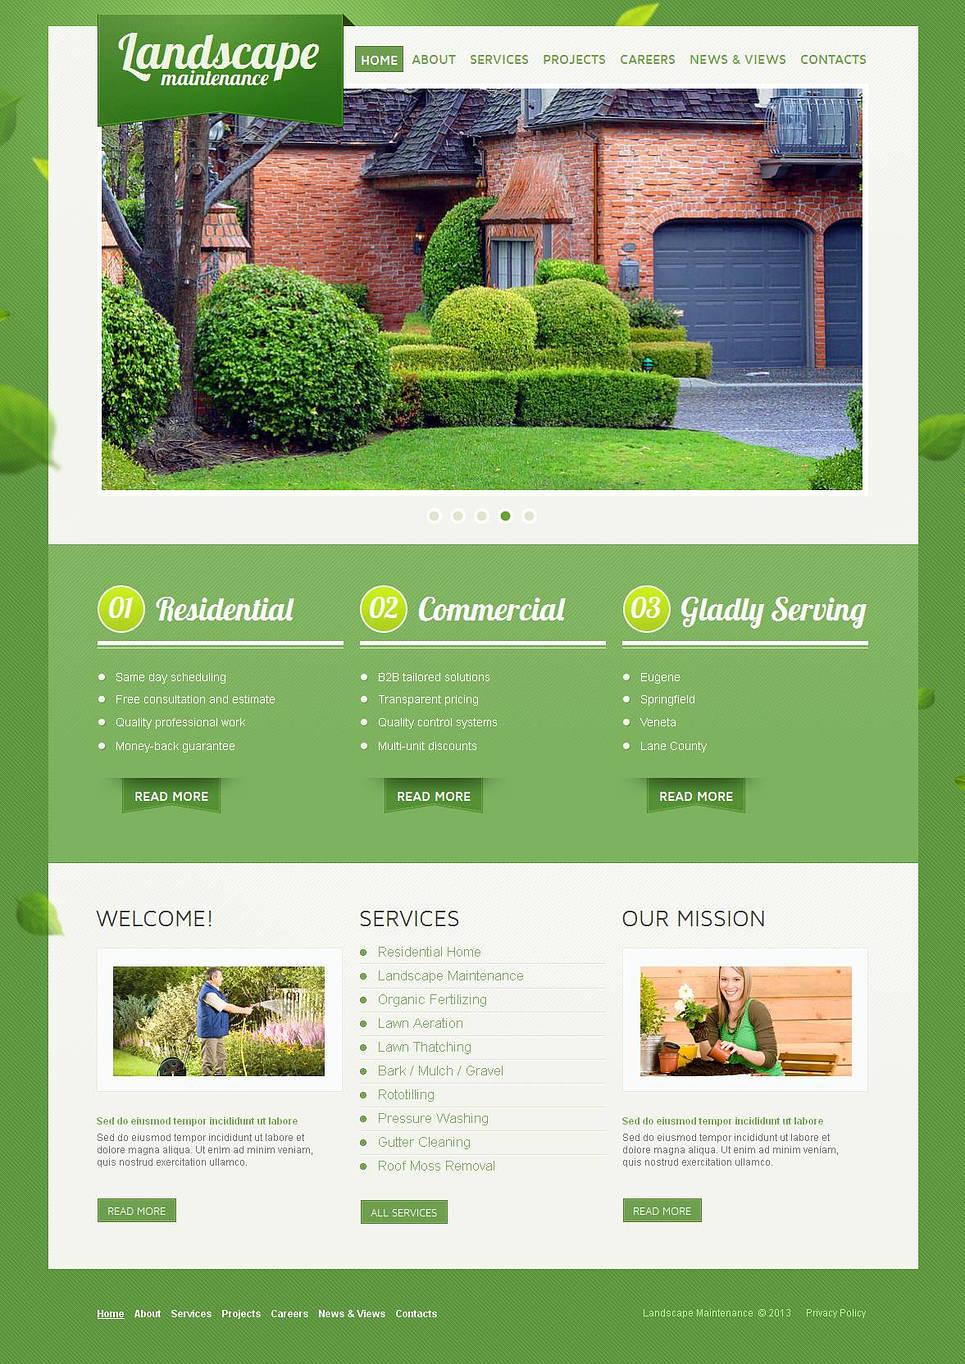 Landscape Design Website Template with Green Background - image